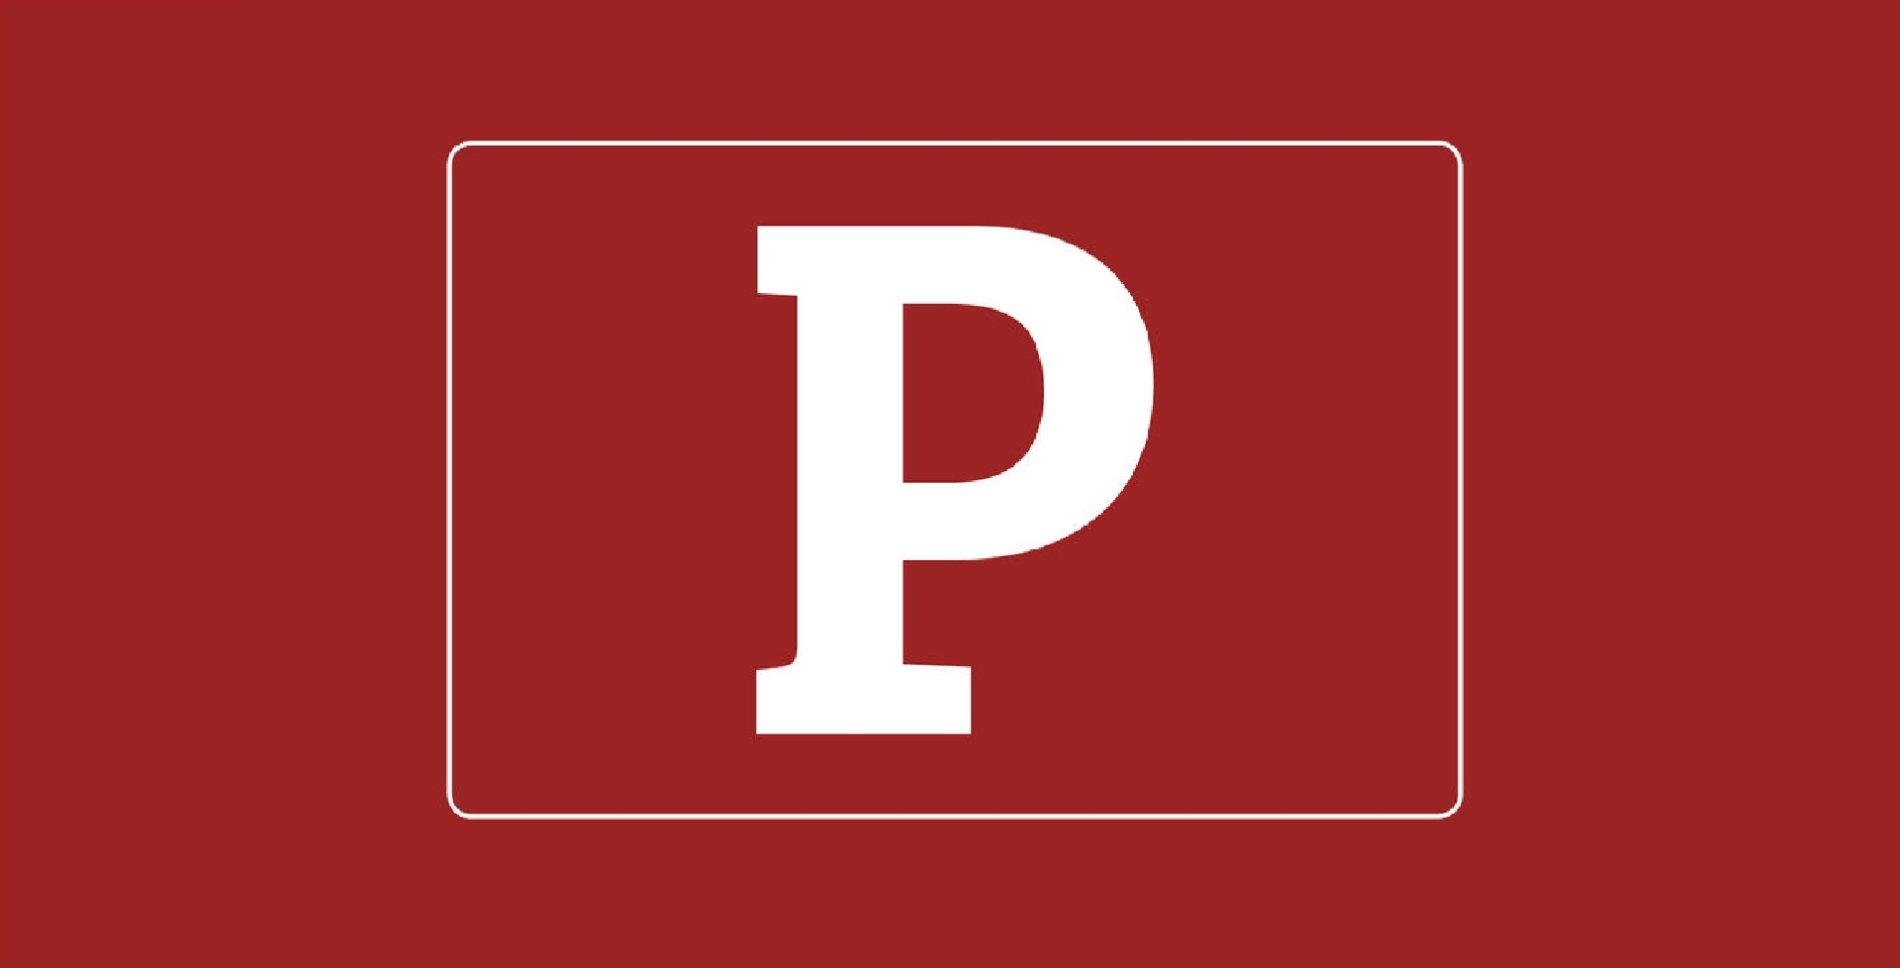 Parkplatz Symbol